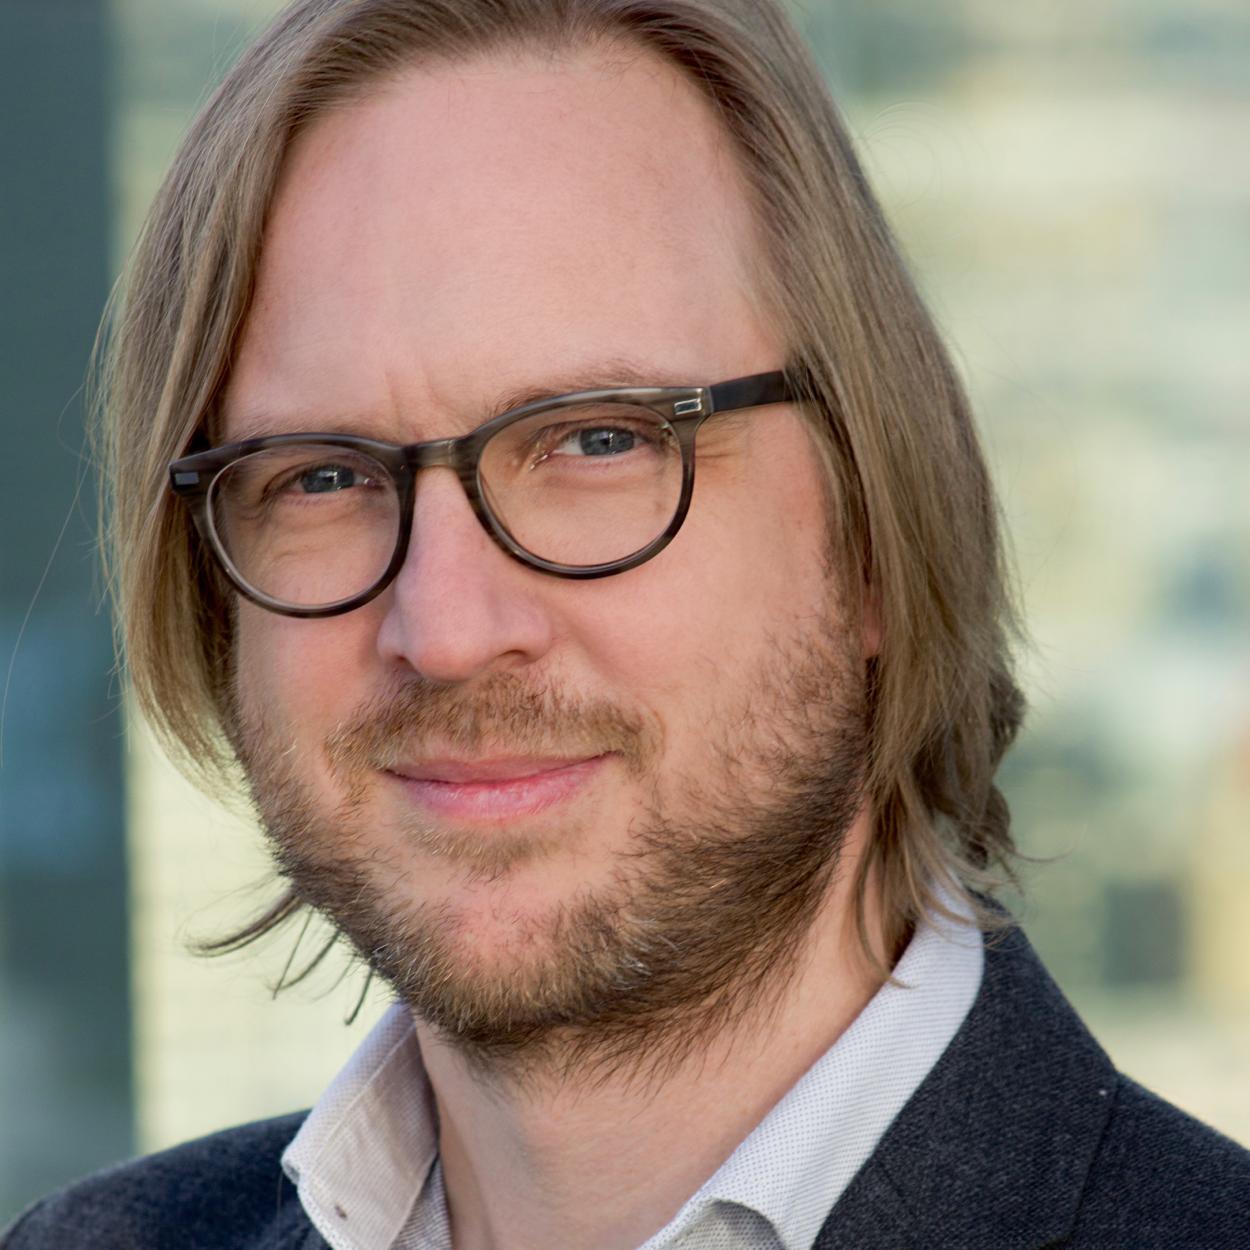 Lars Panquin